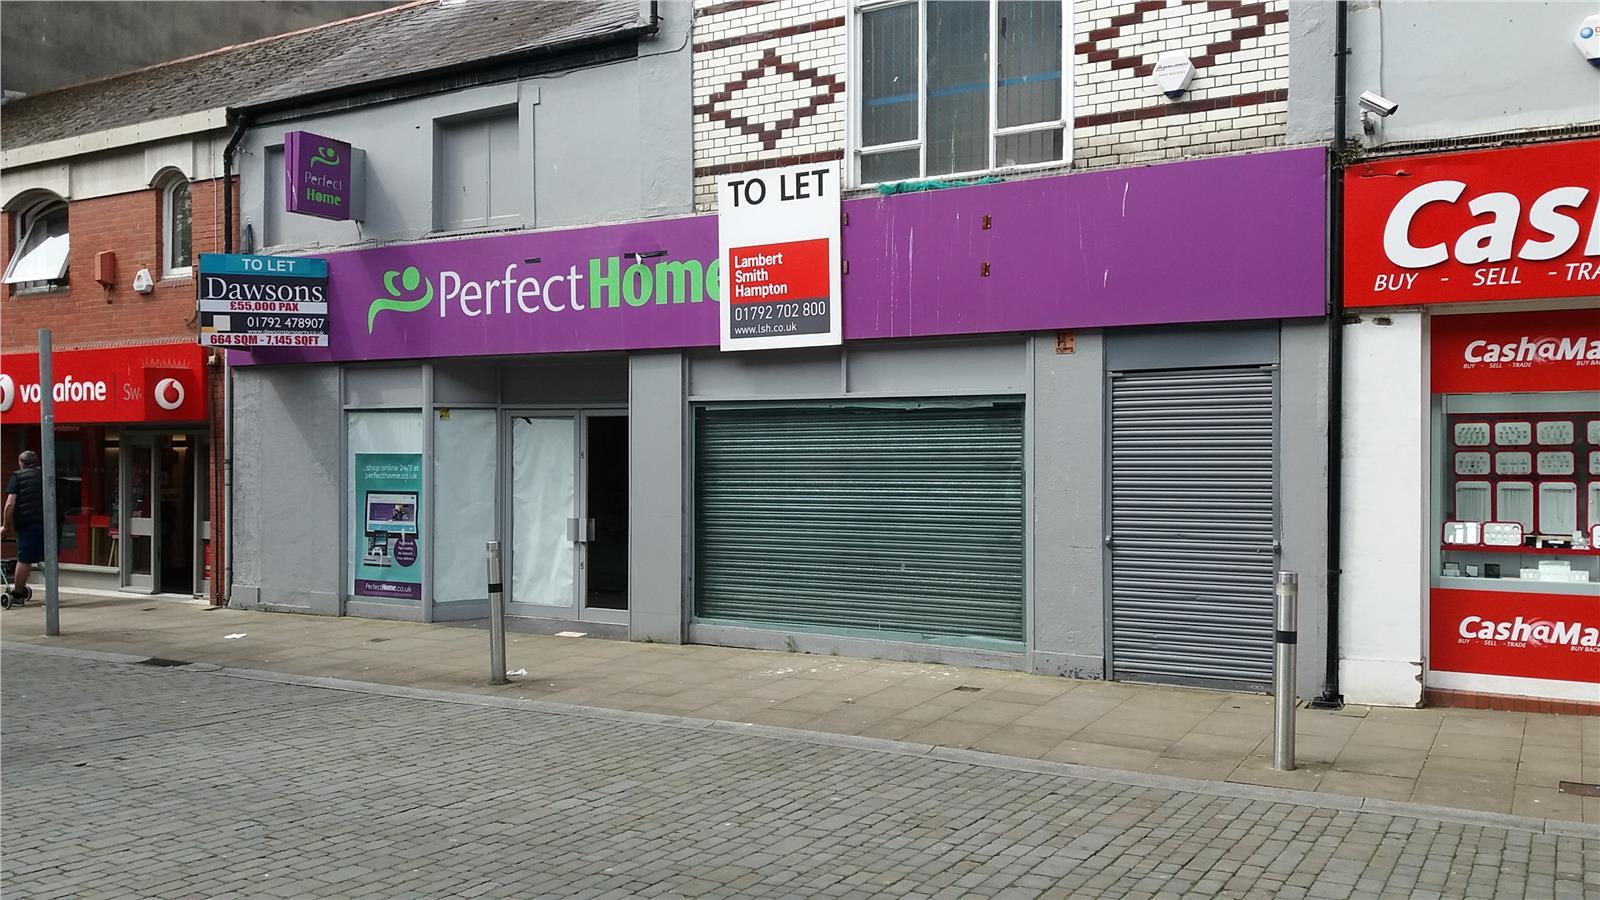 5-6 Union Street Union Street, Swansea, Swansea, SA1 3EE